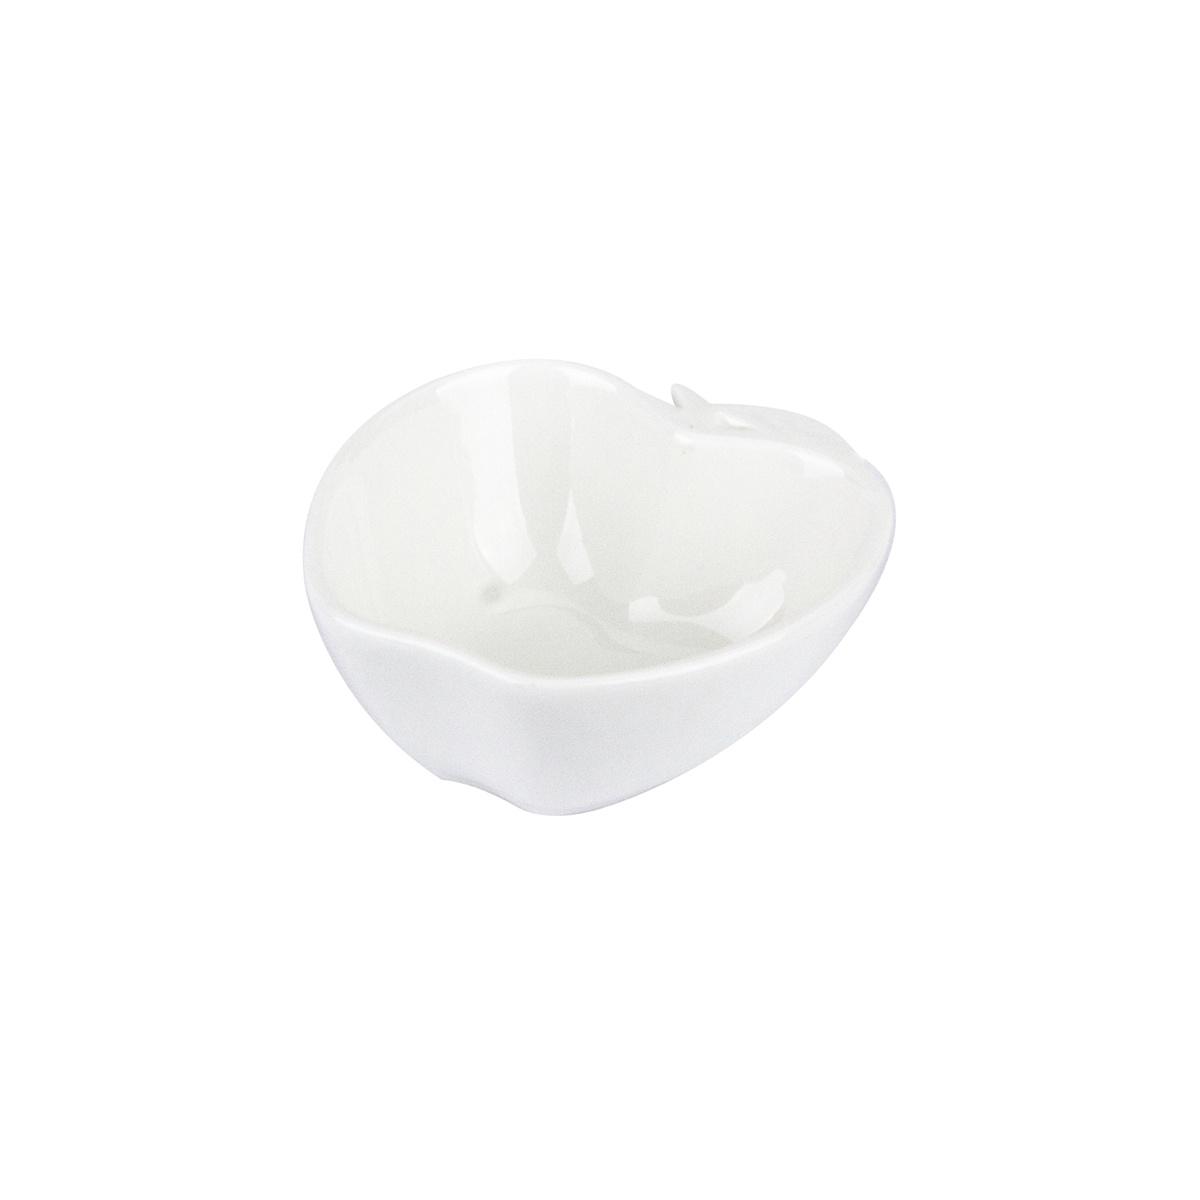 Standart Ultraform Porselen Elma Kase 10 Cm